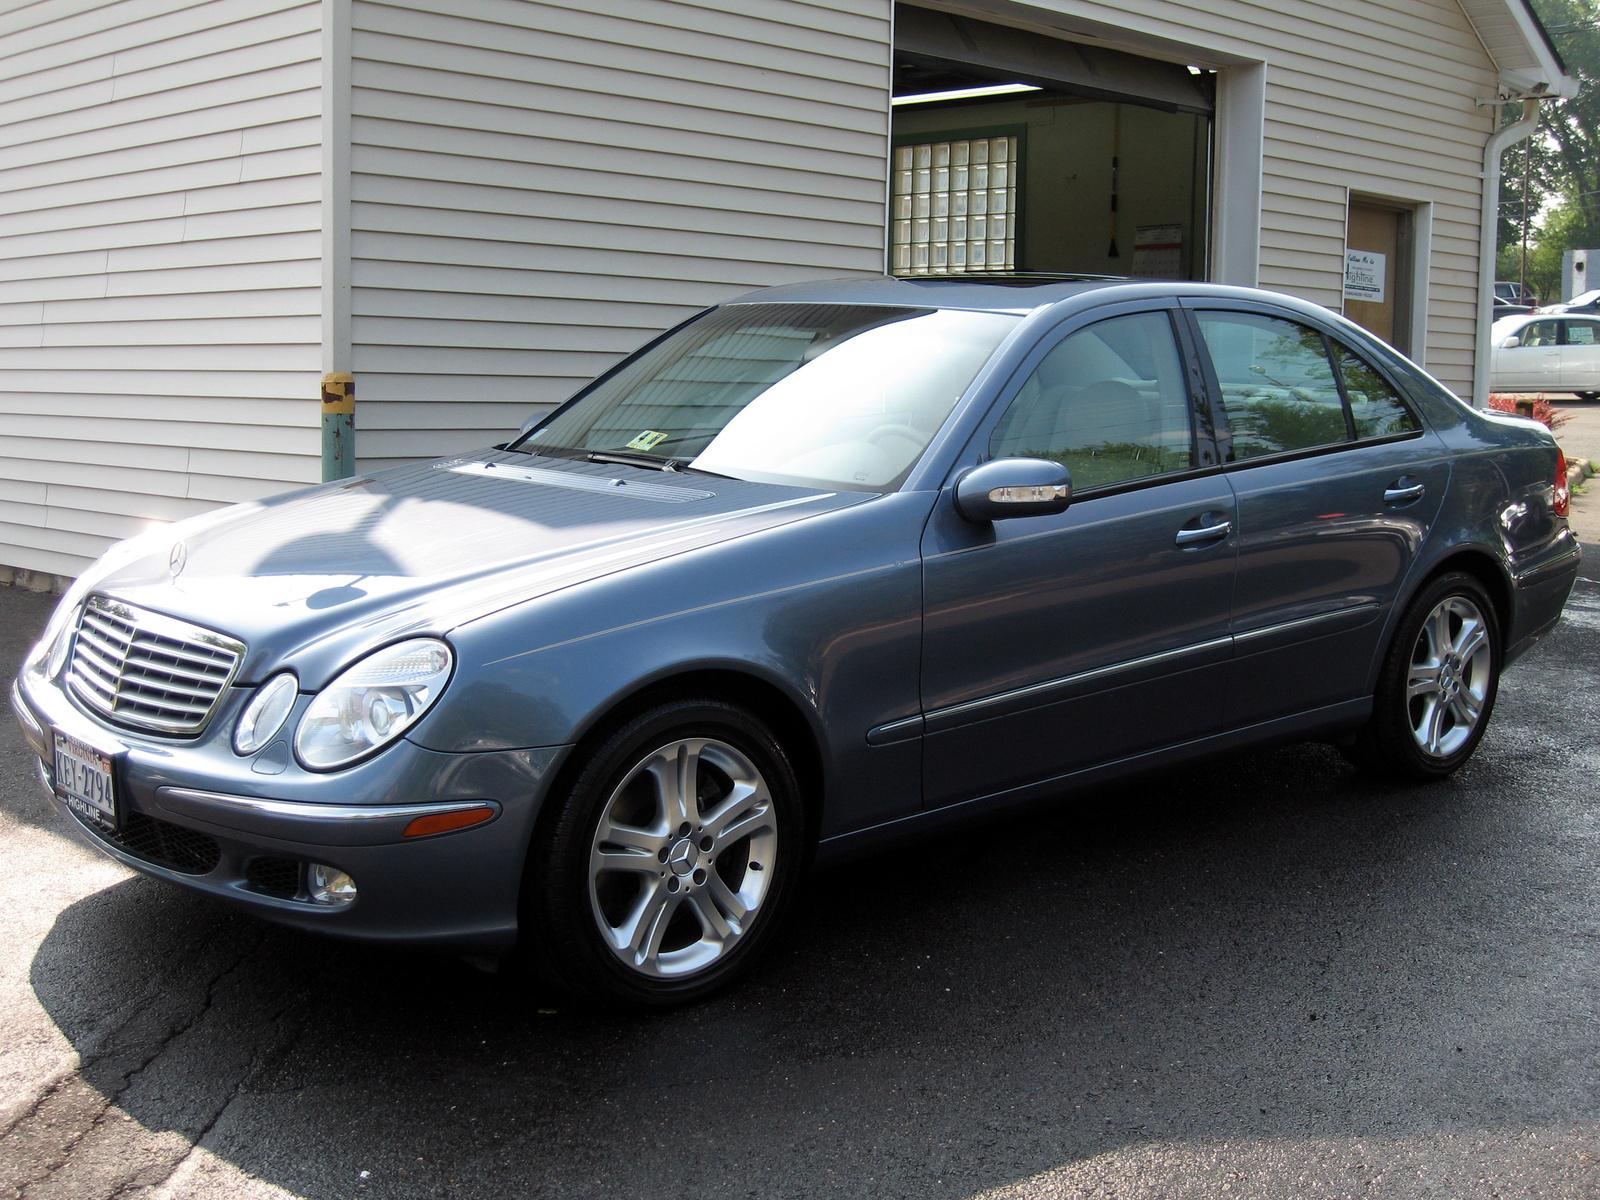 2004 mercedes e class partsopen for Mercedes benz 2005 e320 parts